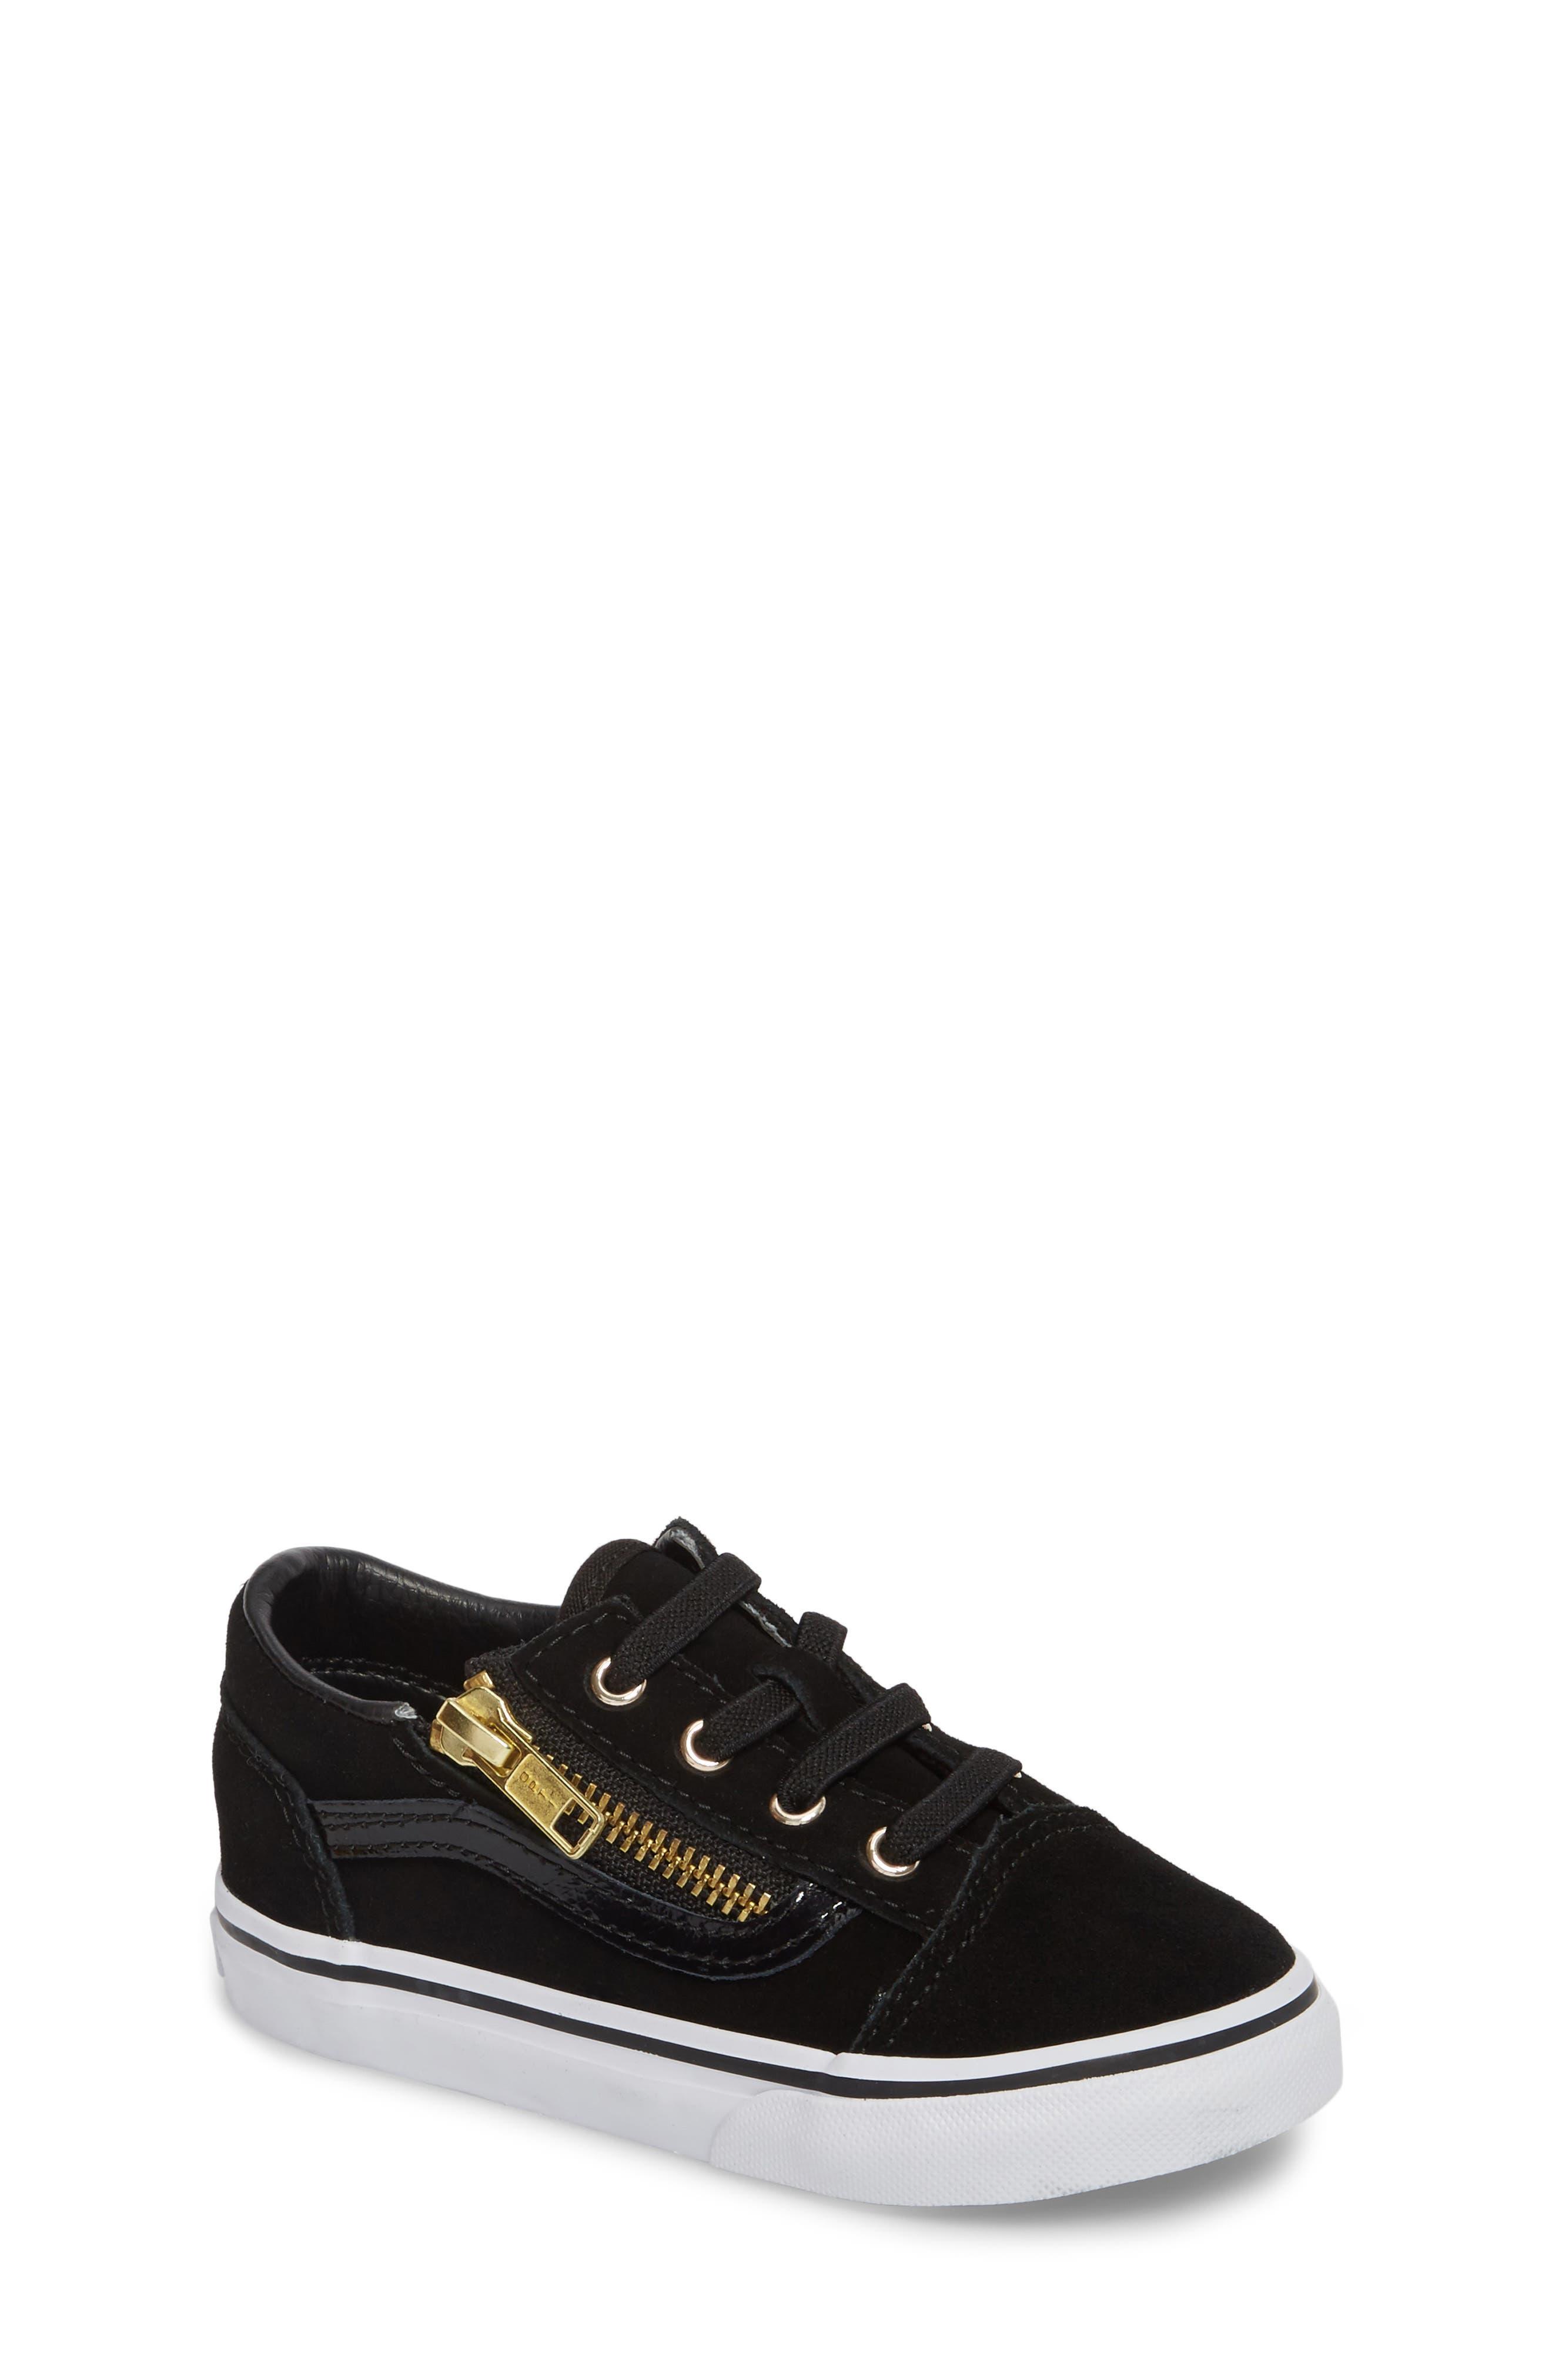 Main Image - Vans Old Skool Zip Sneaker (Baby, Walker & Toddler)